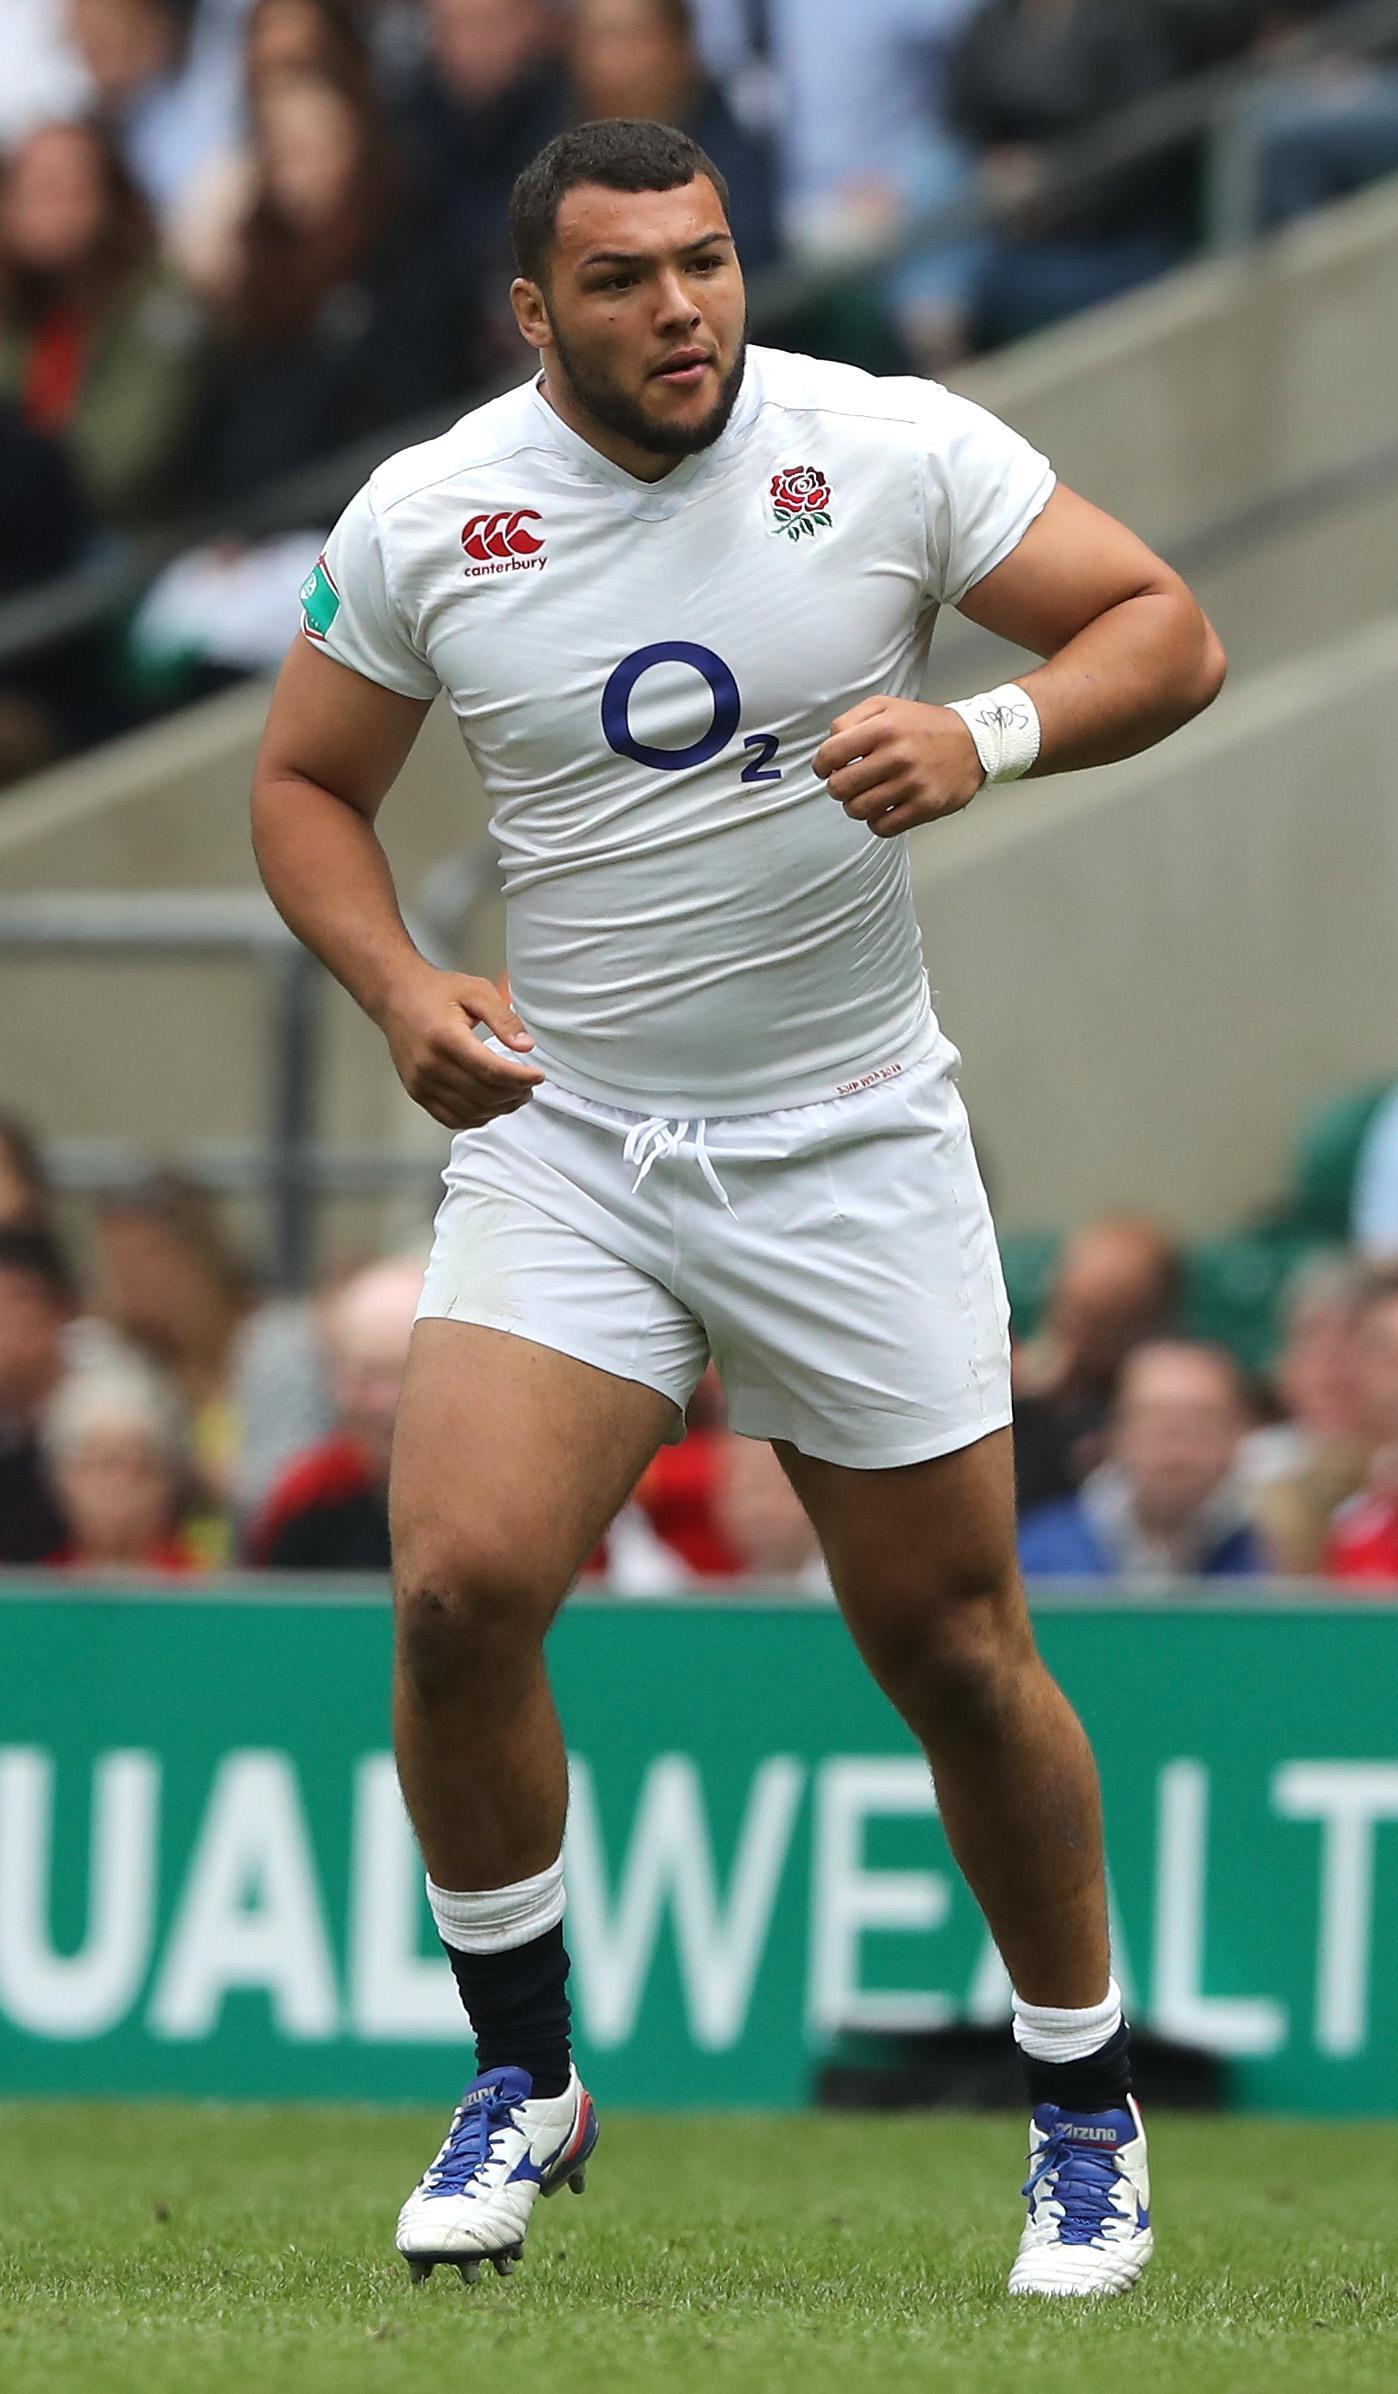 Ellis Genge has represented England 5 times at prop